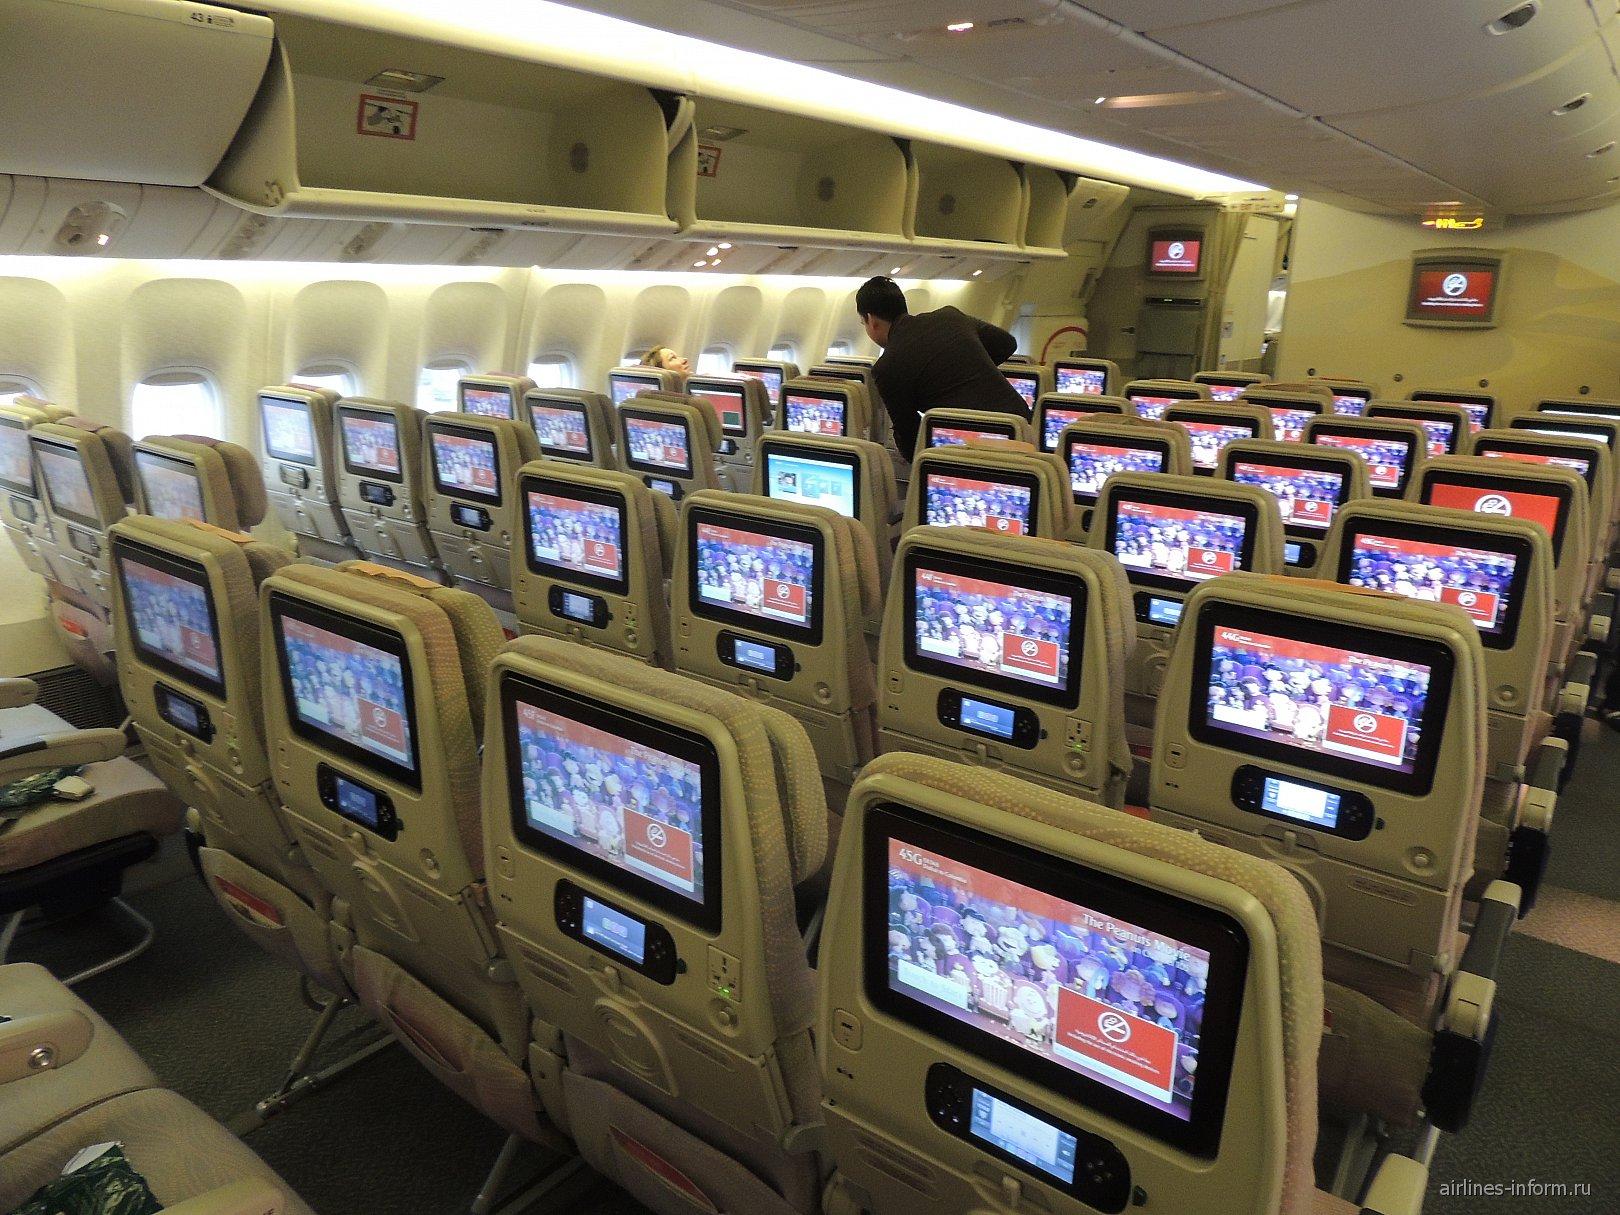 Пассажирский салон в самолете Боинг-777-300 авиакомпании Emirates